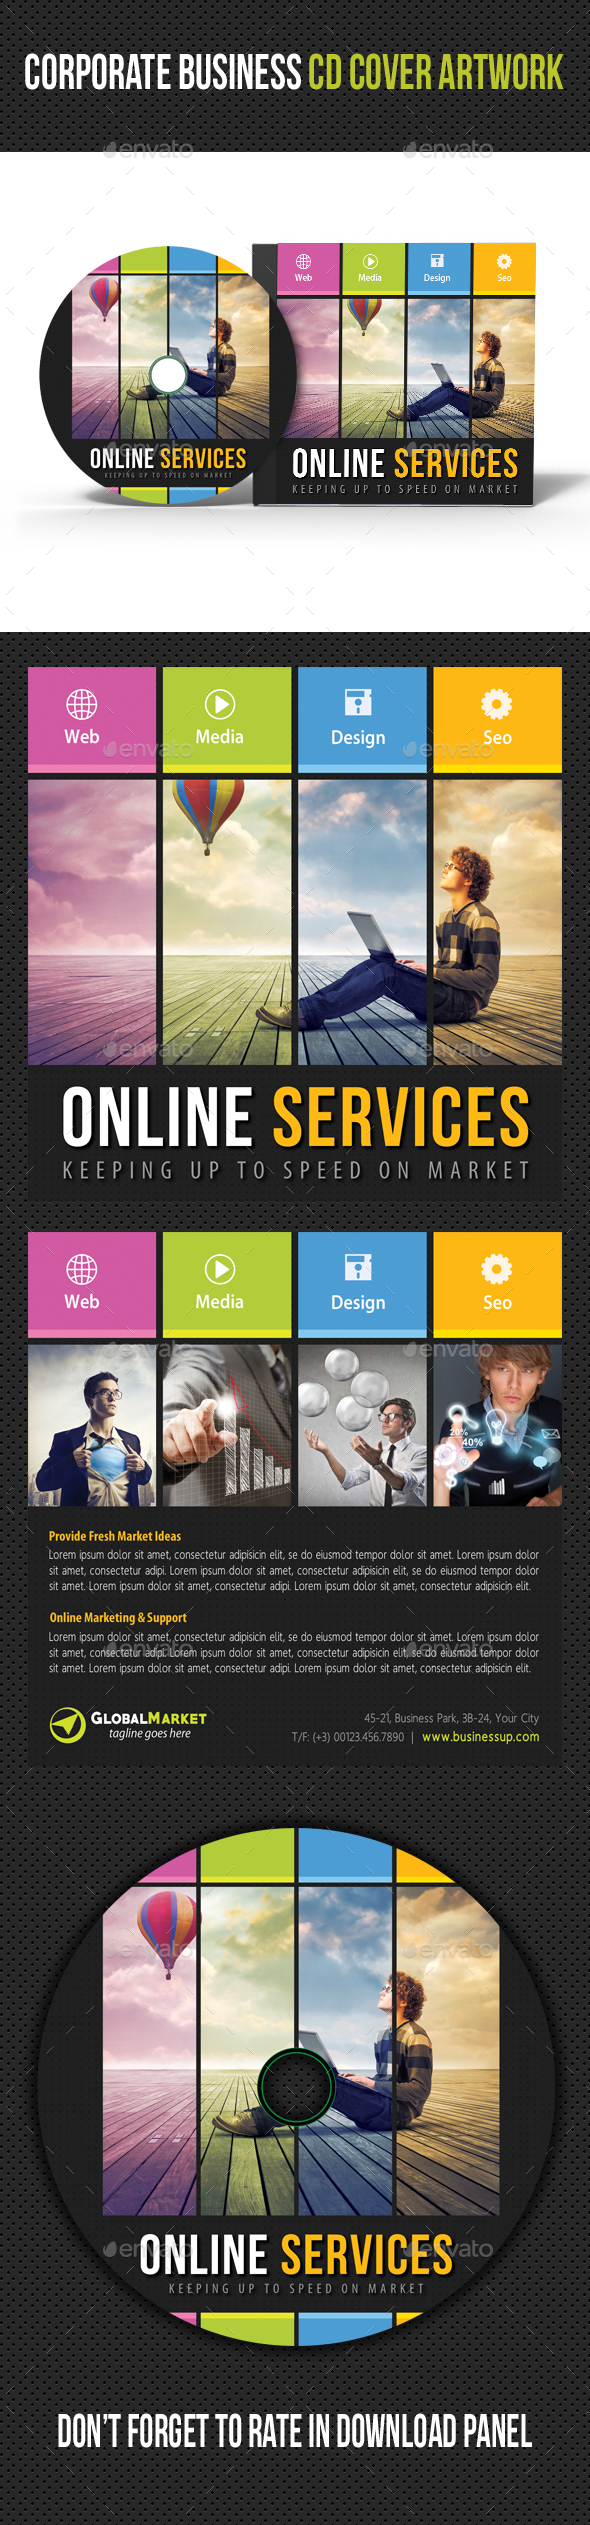 Corporate Business CD Cover Artwork V04 - CD & DVD Artwork Print Templates